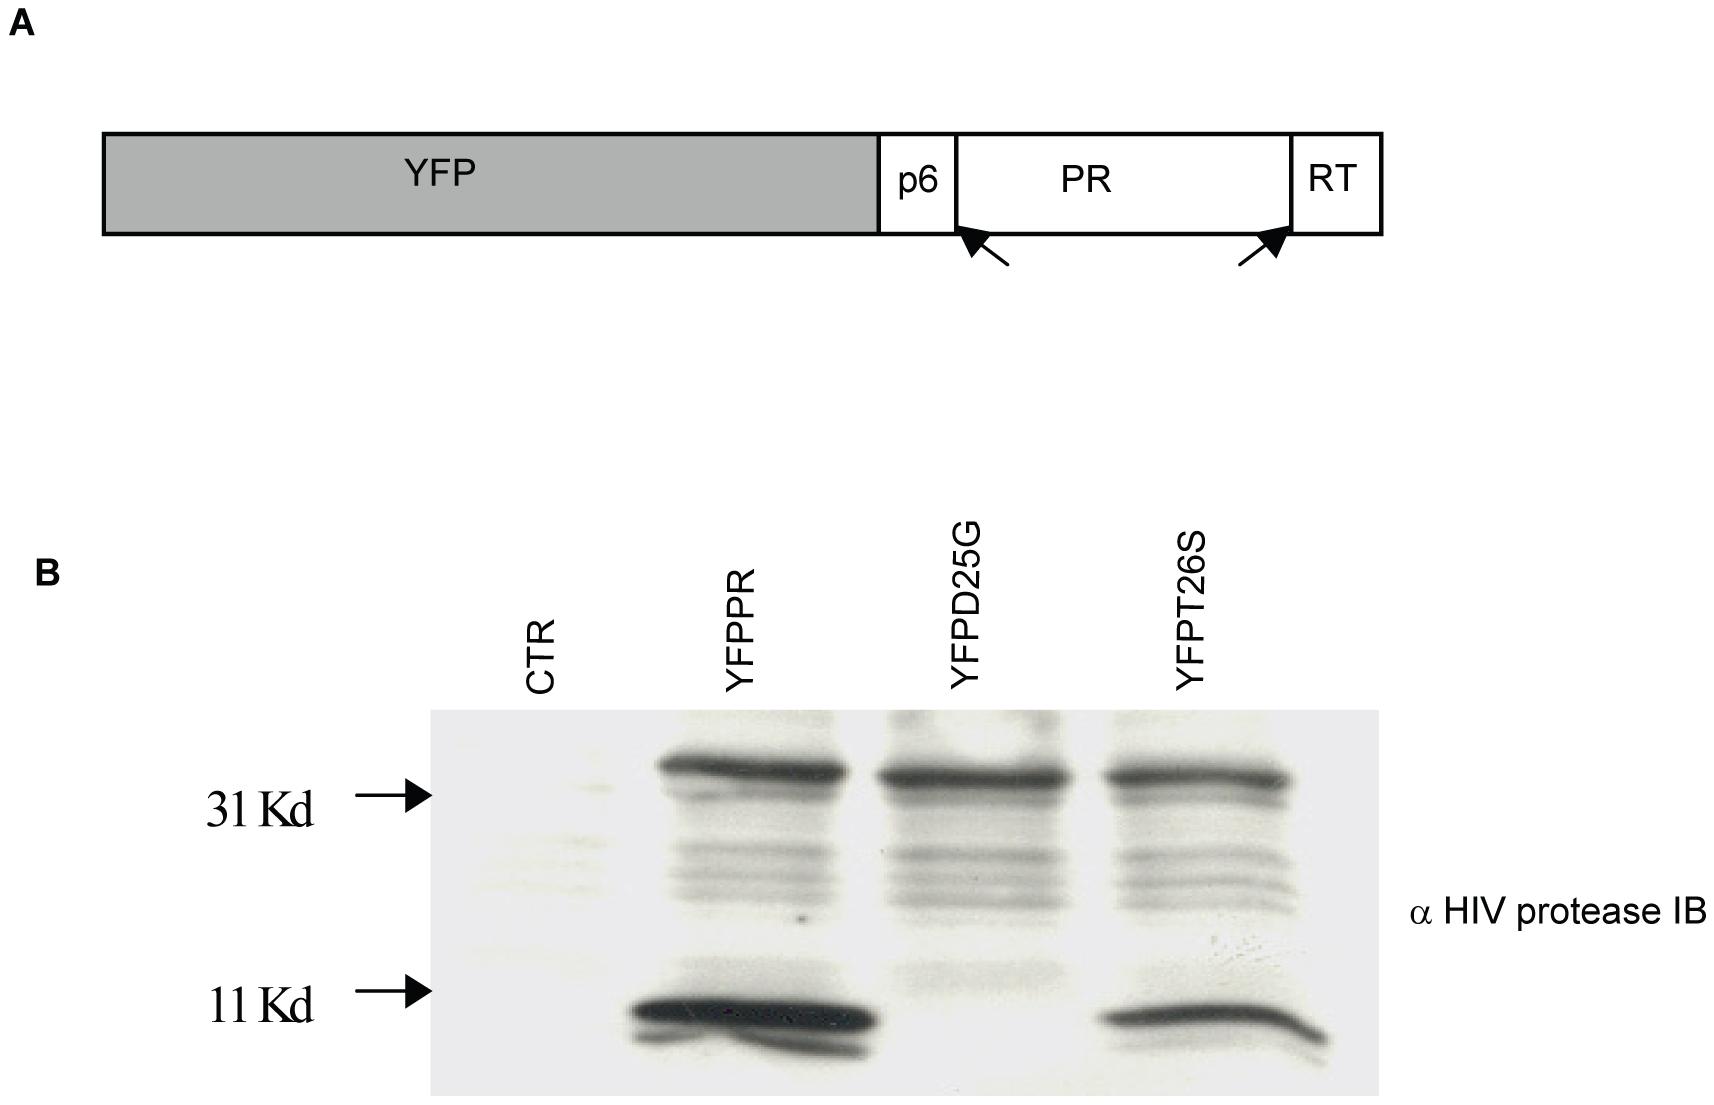 Subcloning HIV-1PR.